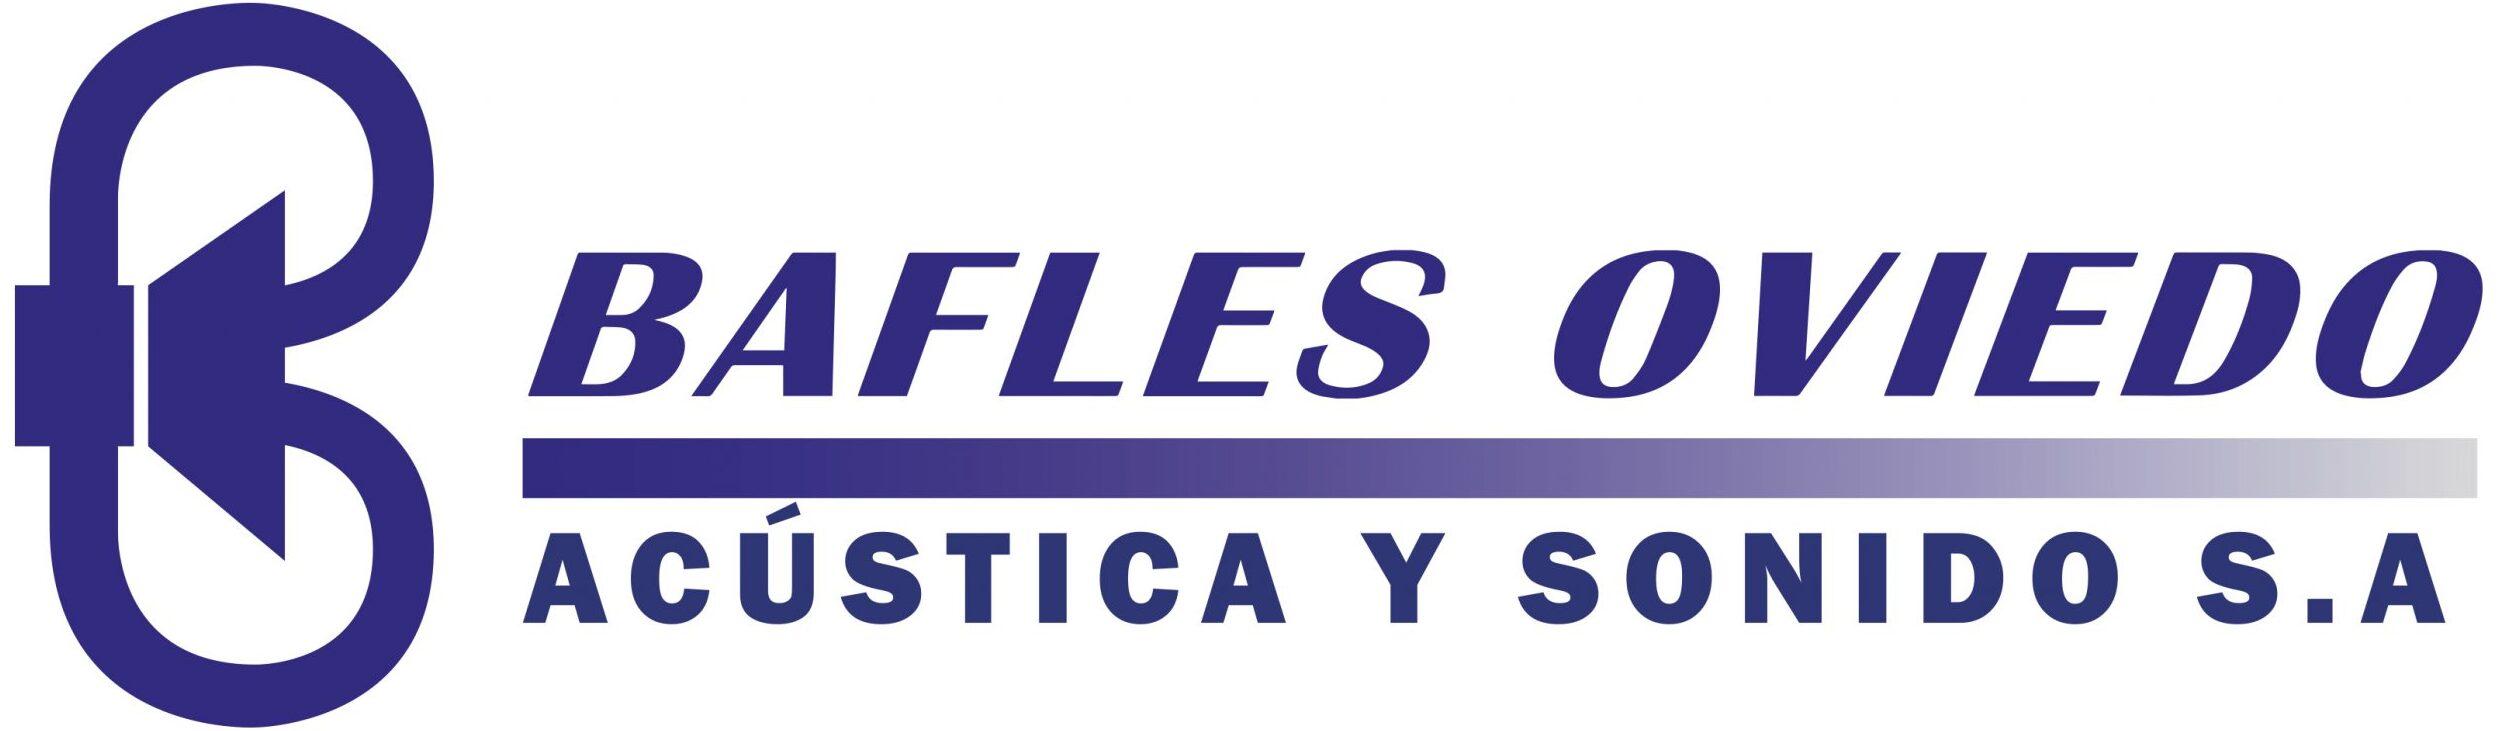 Bafles Oviedo